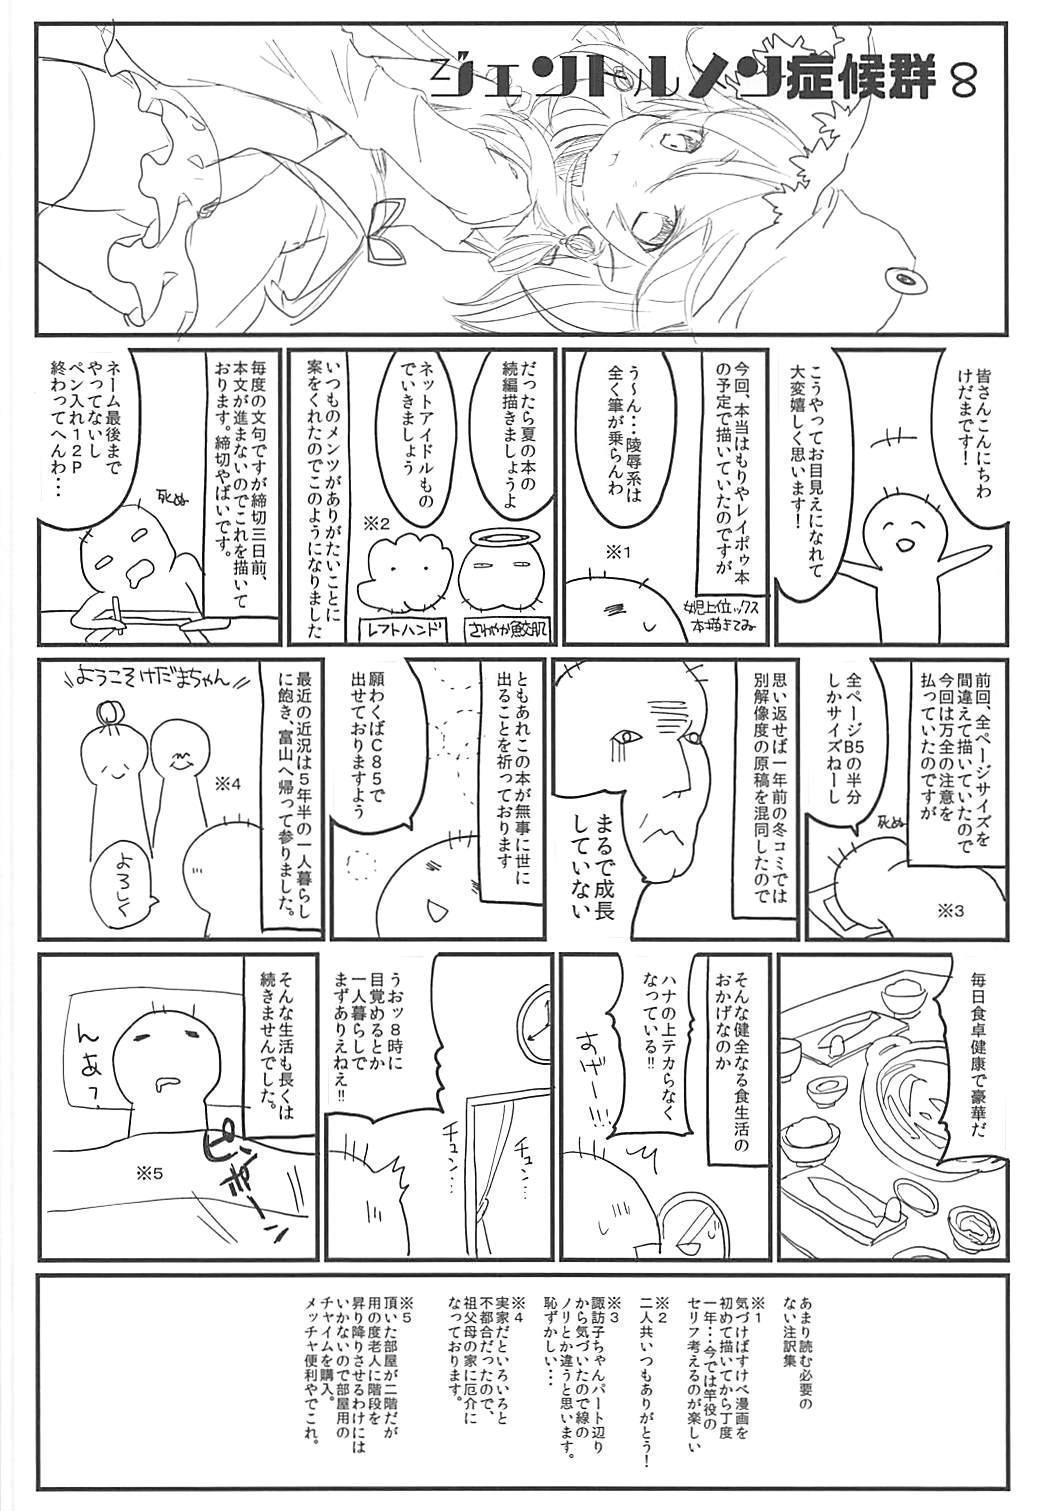 Shinkou Material Sai 30